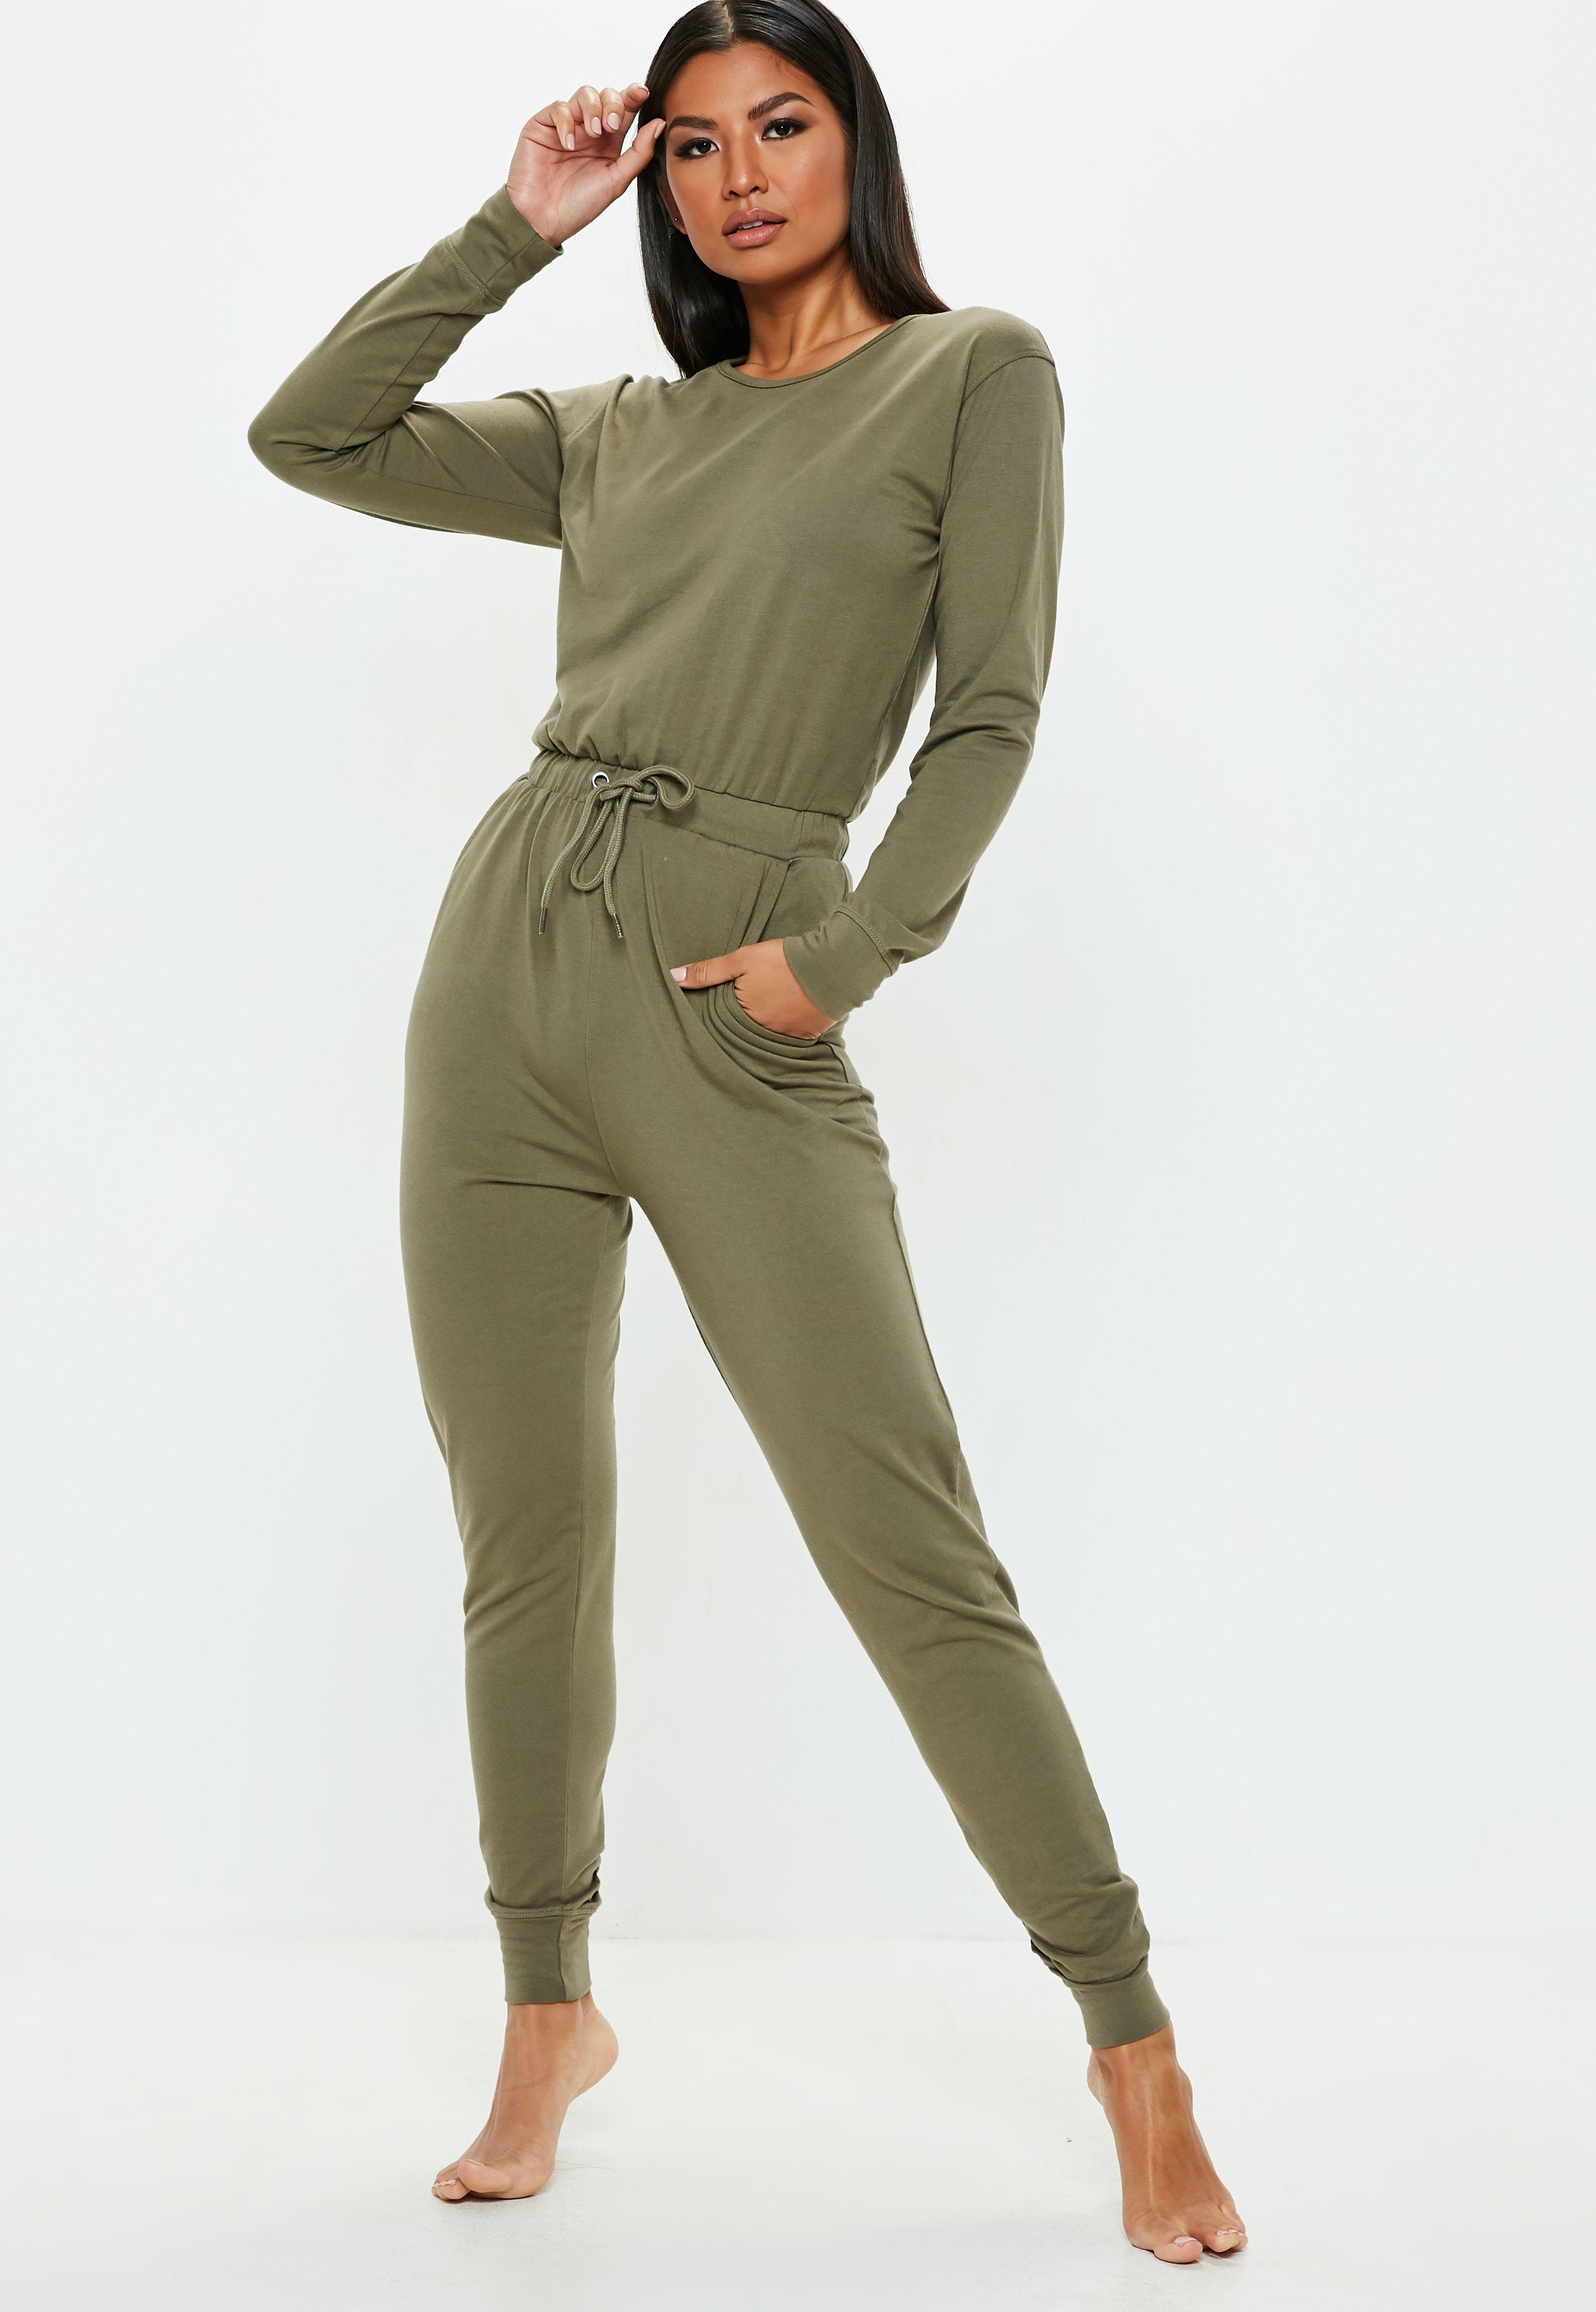 04065dfa1f534 Combinaison casual   Combinaison jersey femme - Missguided